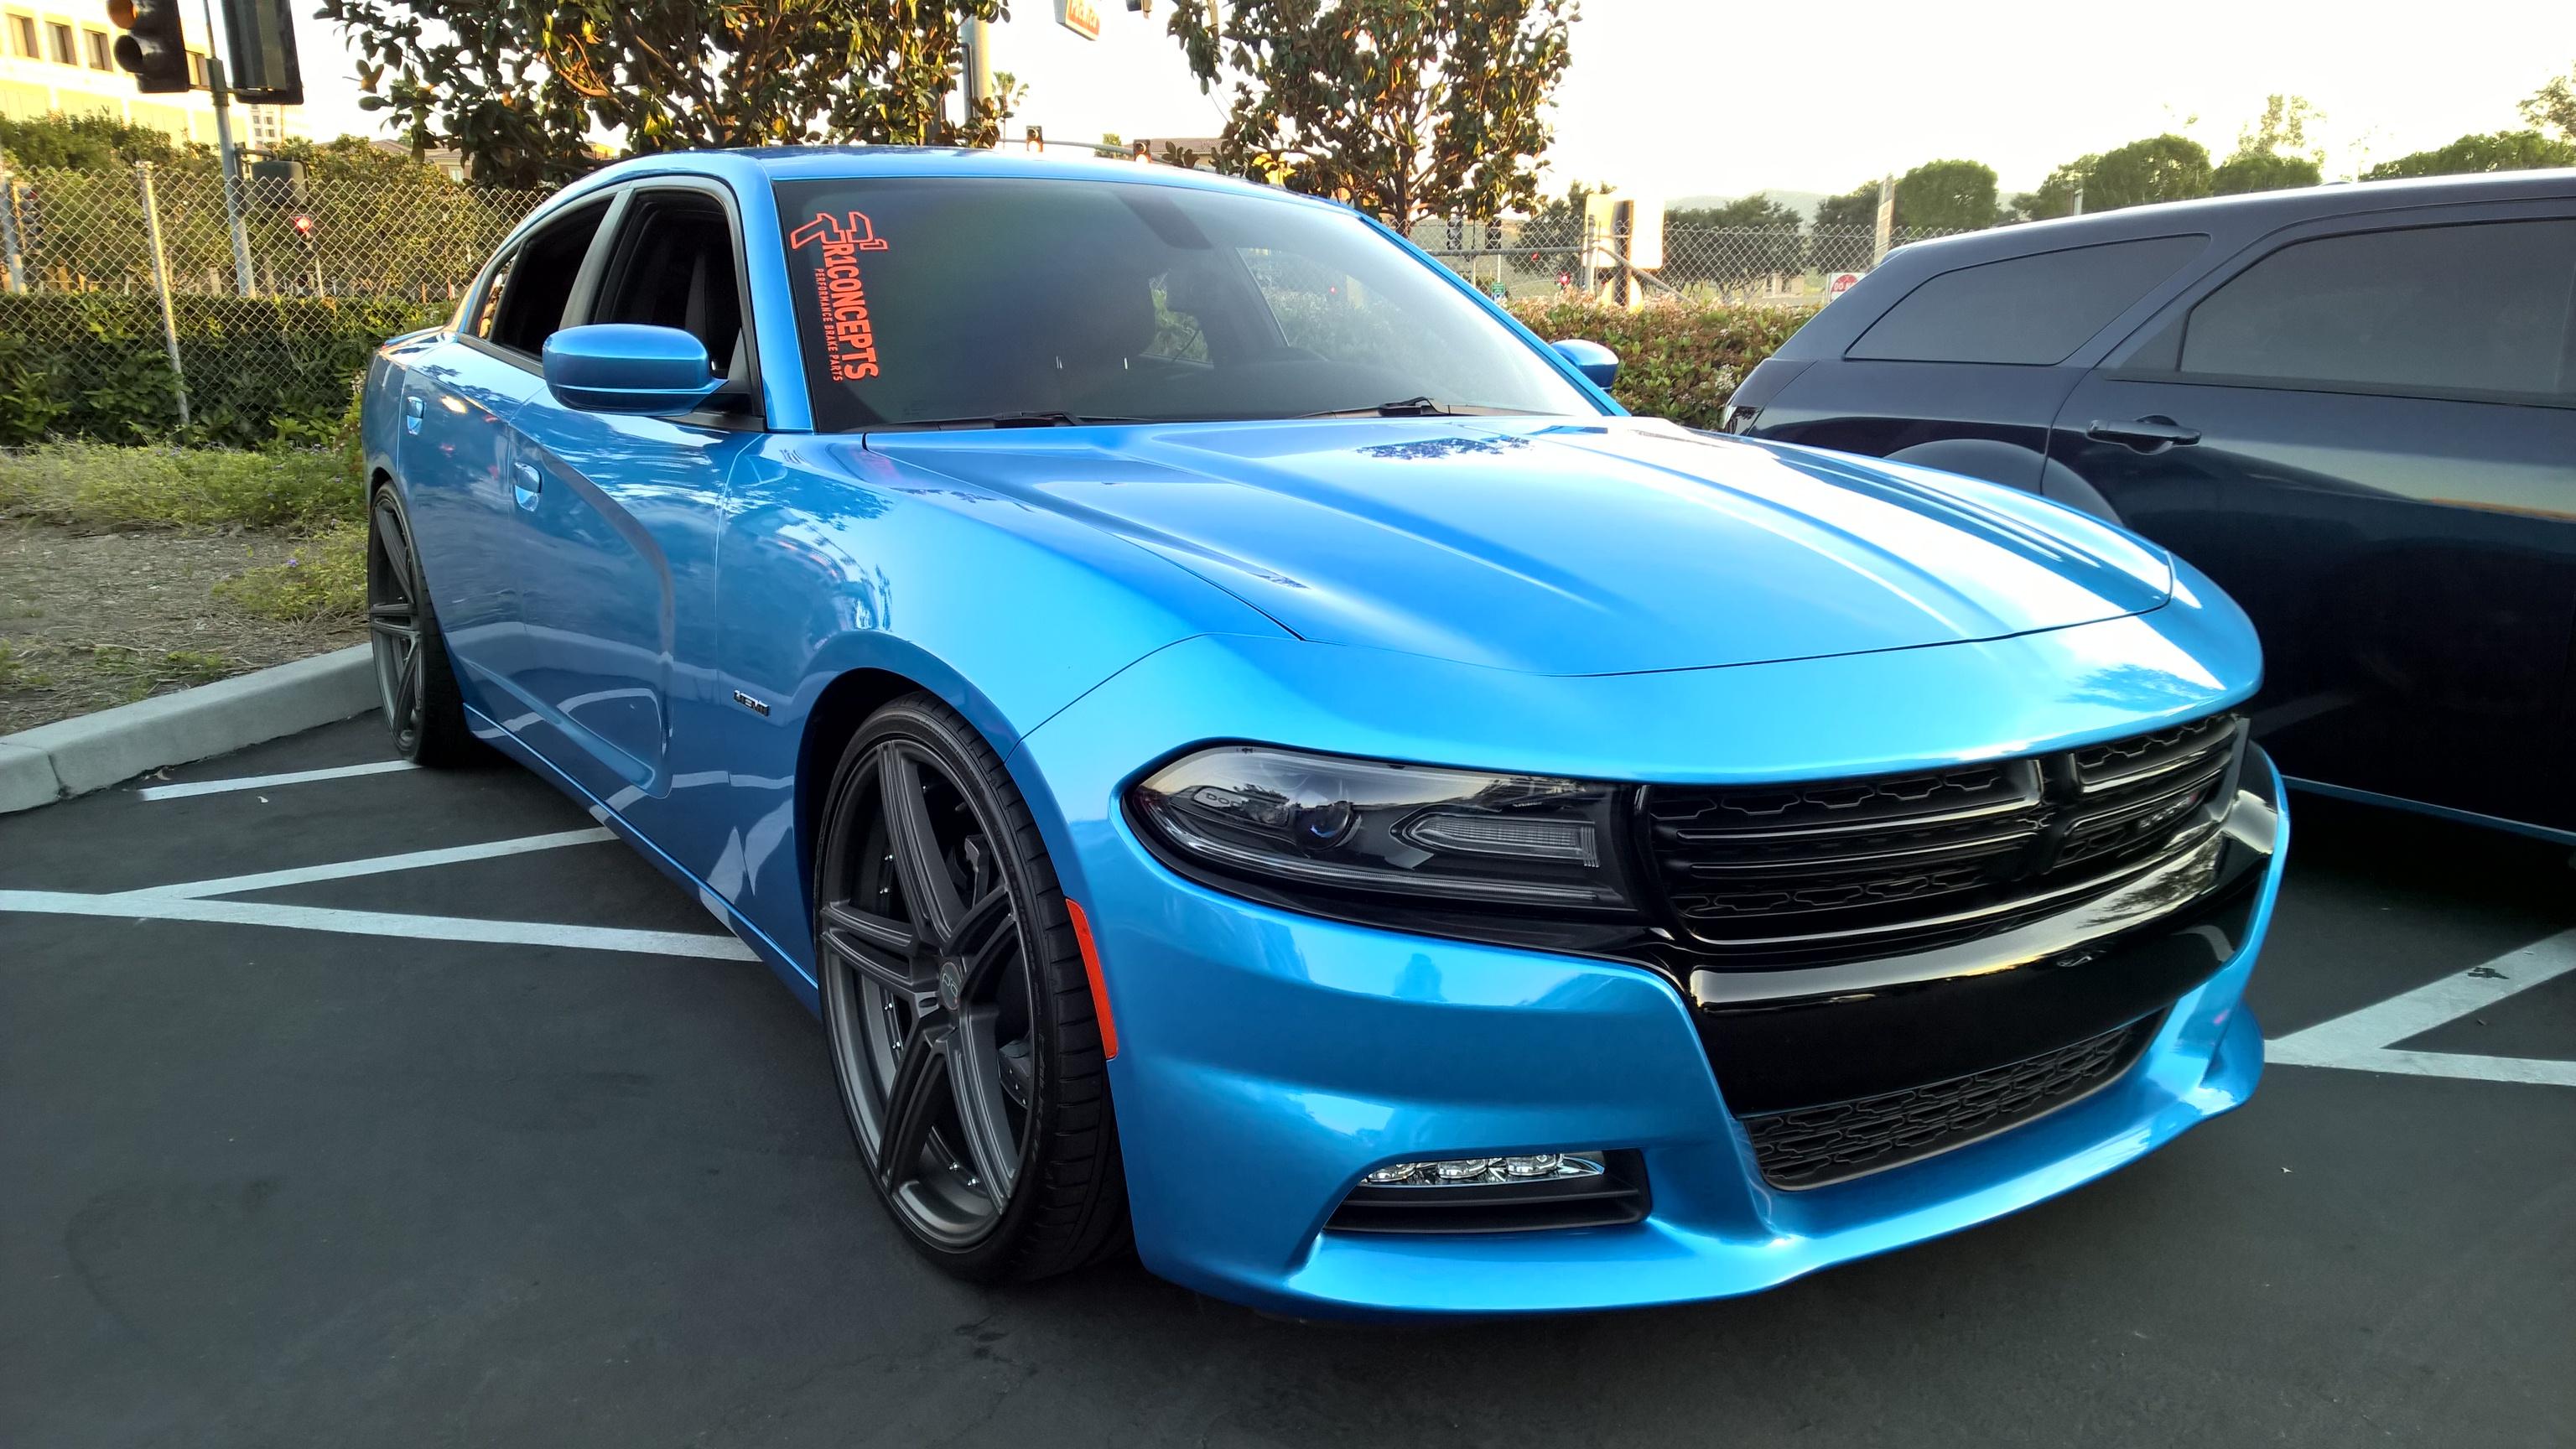 b5 blue charger.jpg